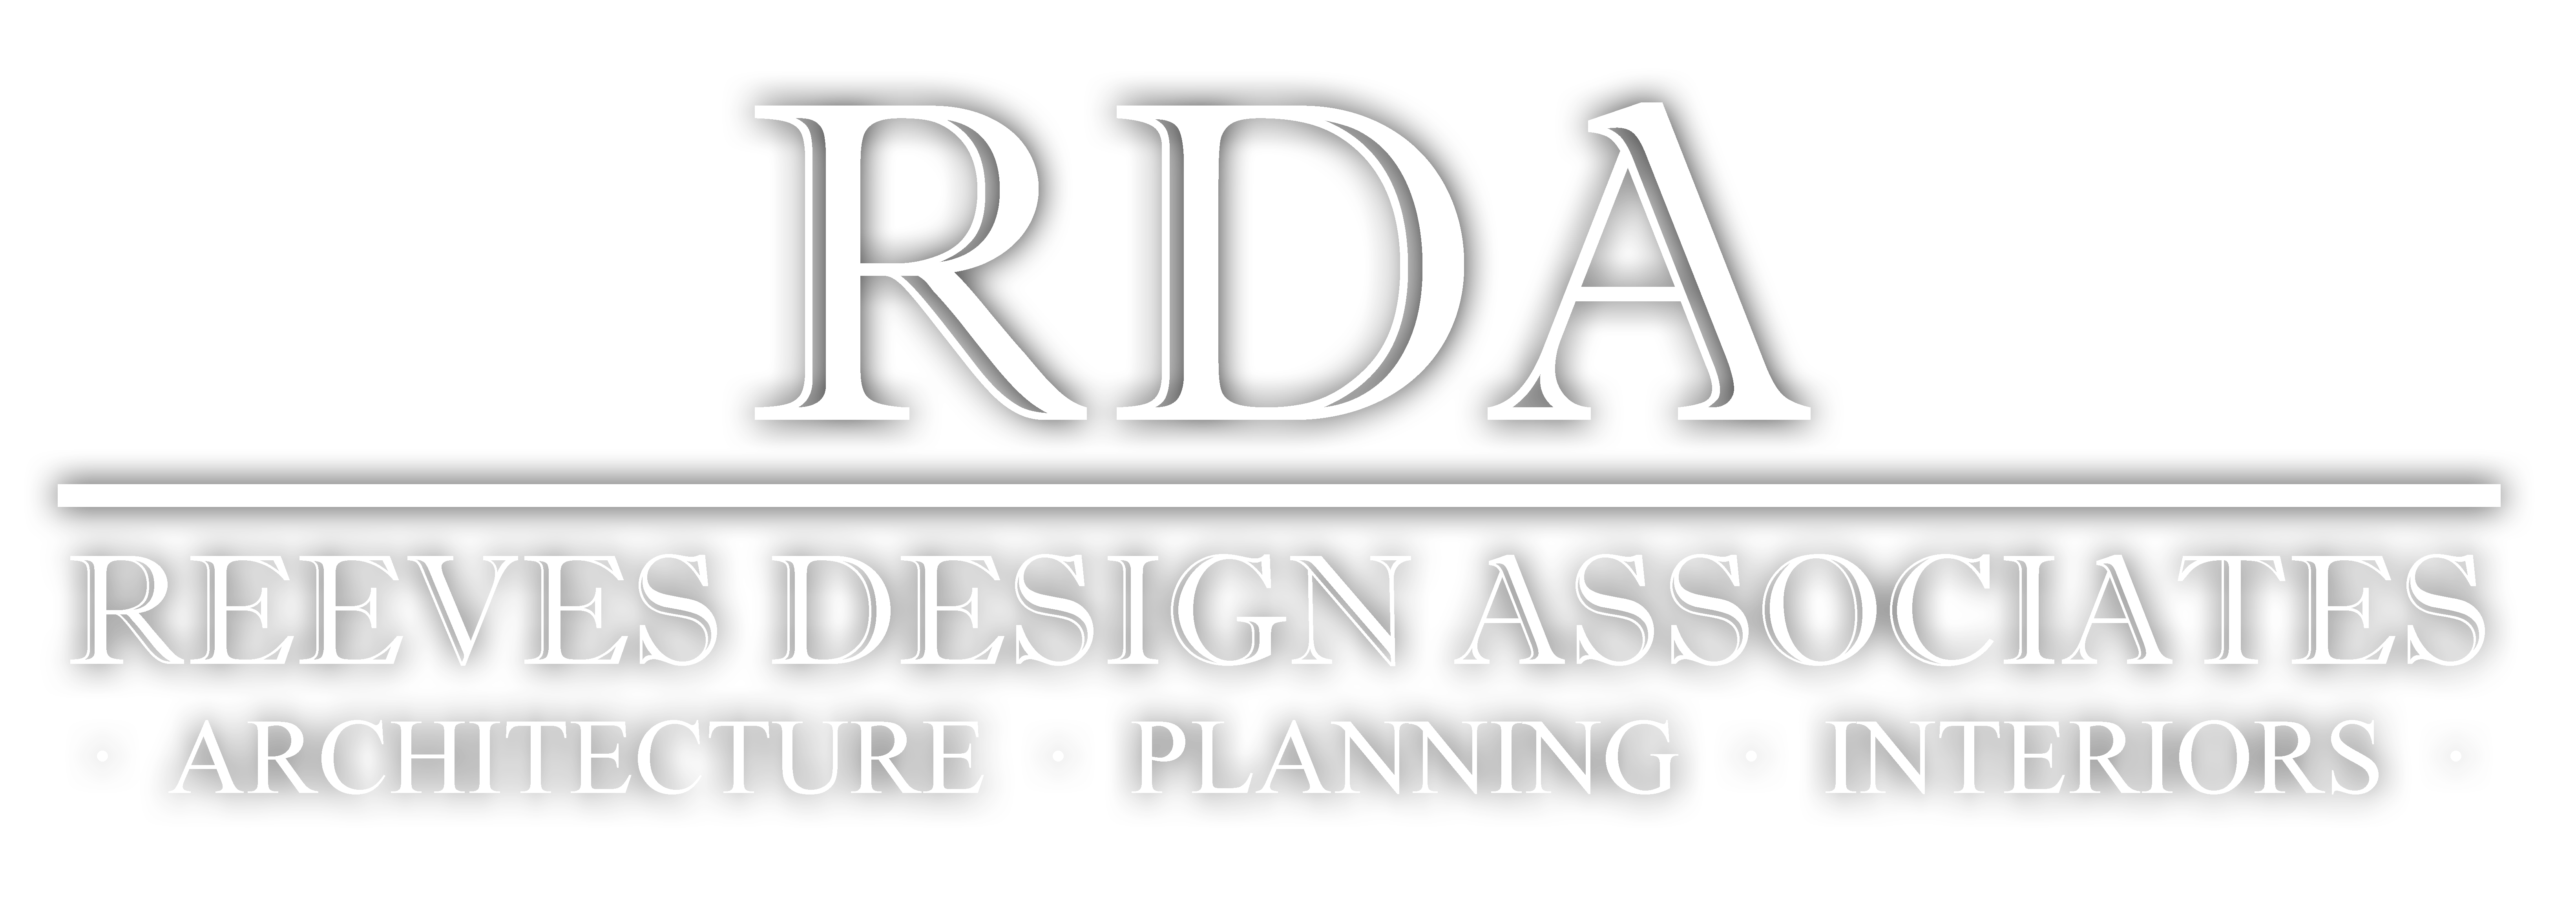 Reeves Design Associates